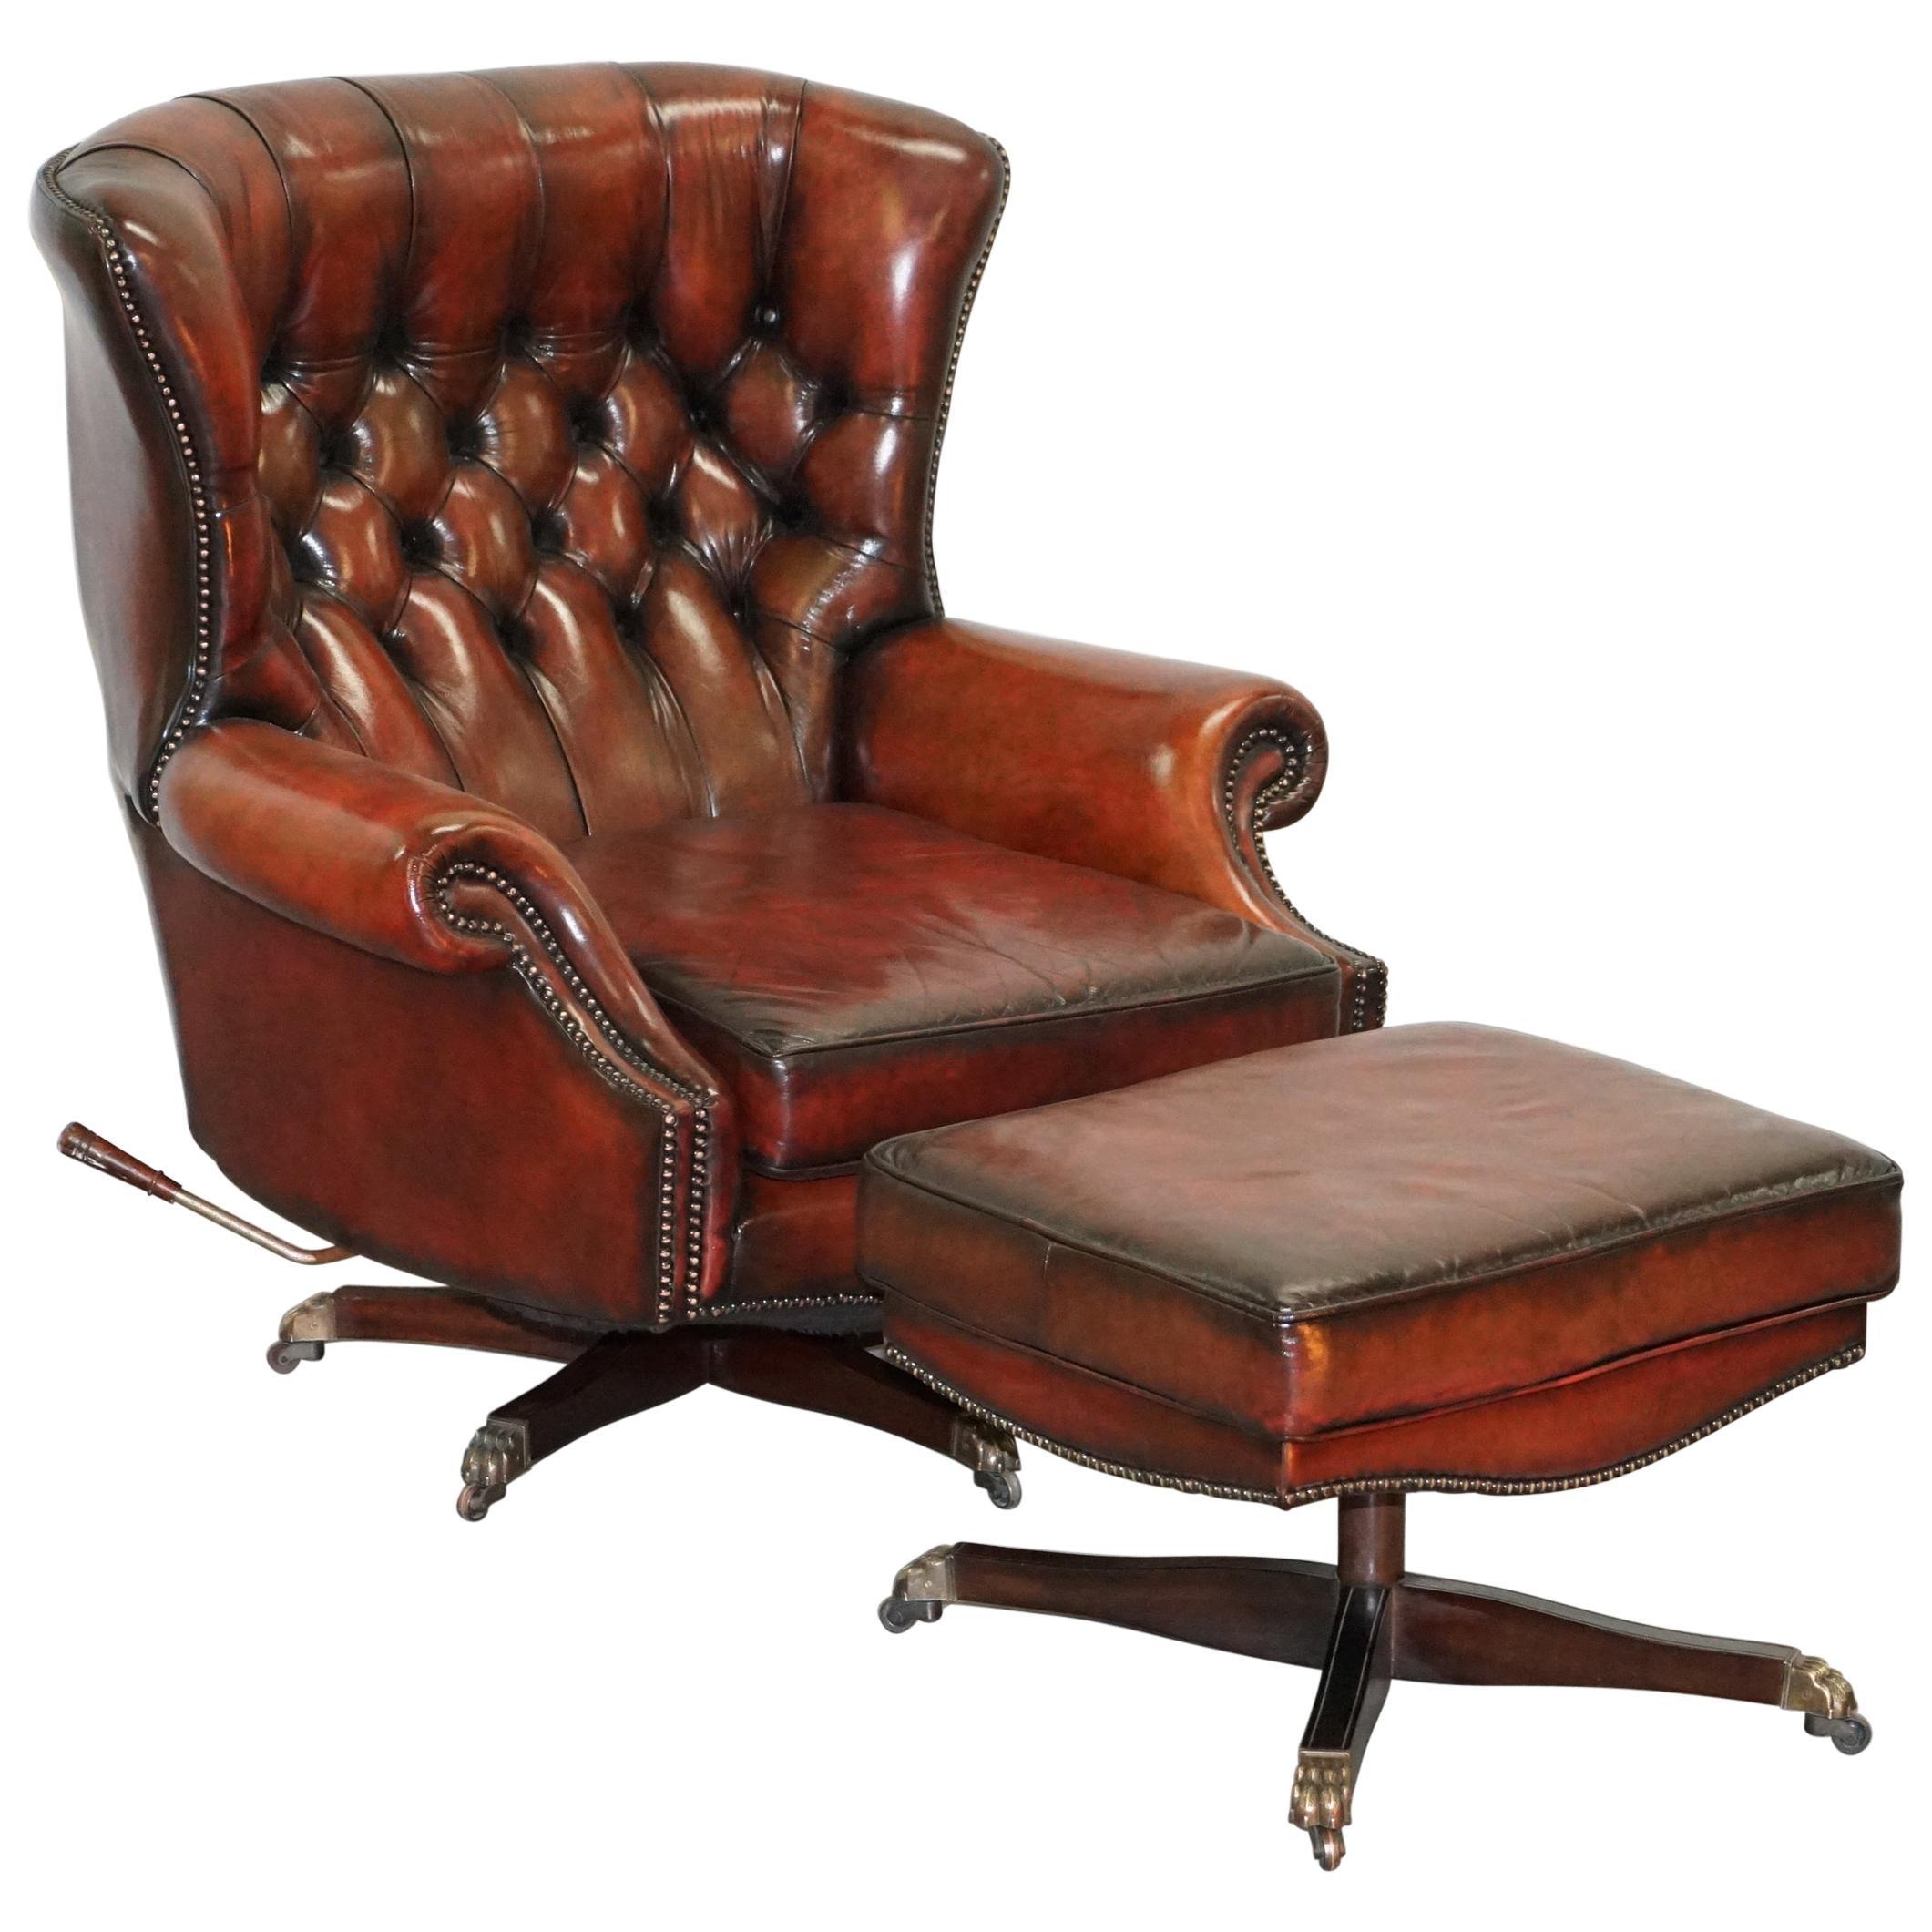 Restored Harrods London Brown Leather Chesterfield Swivel Armchair & Footstool